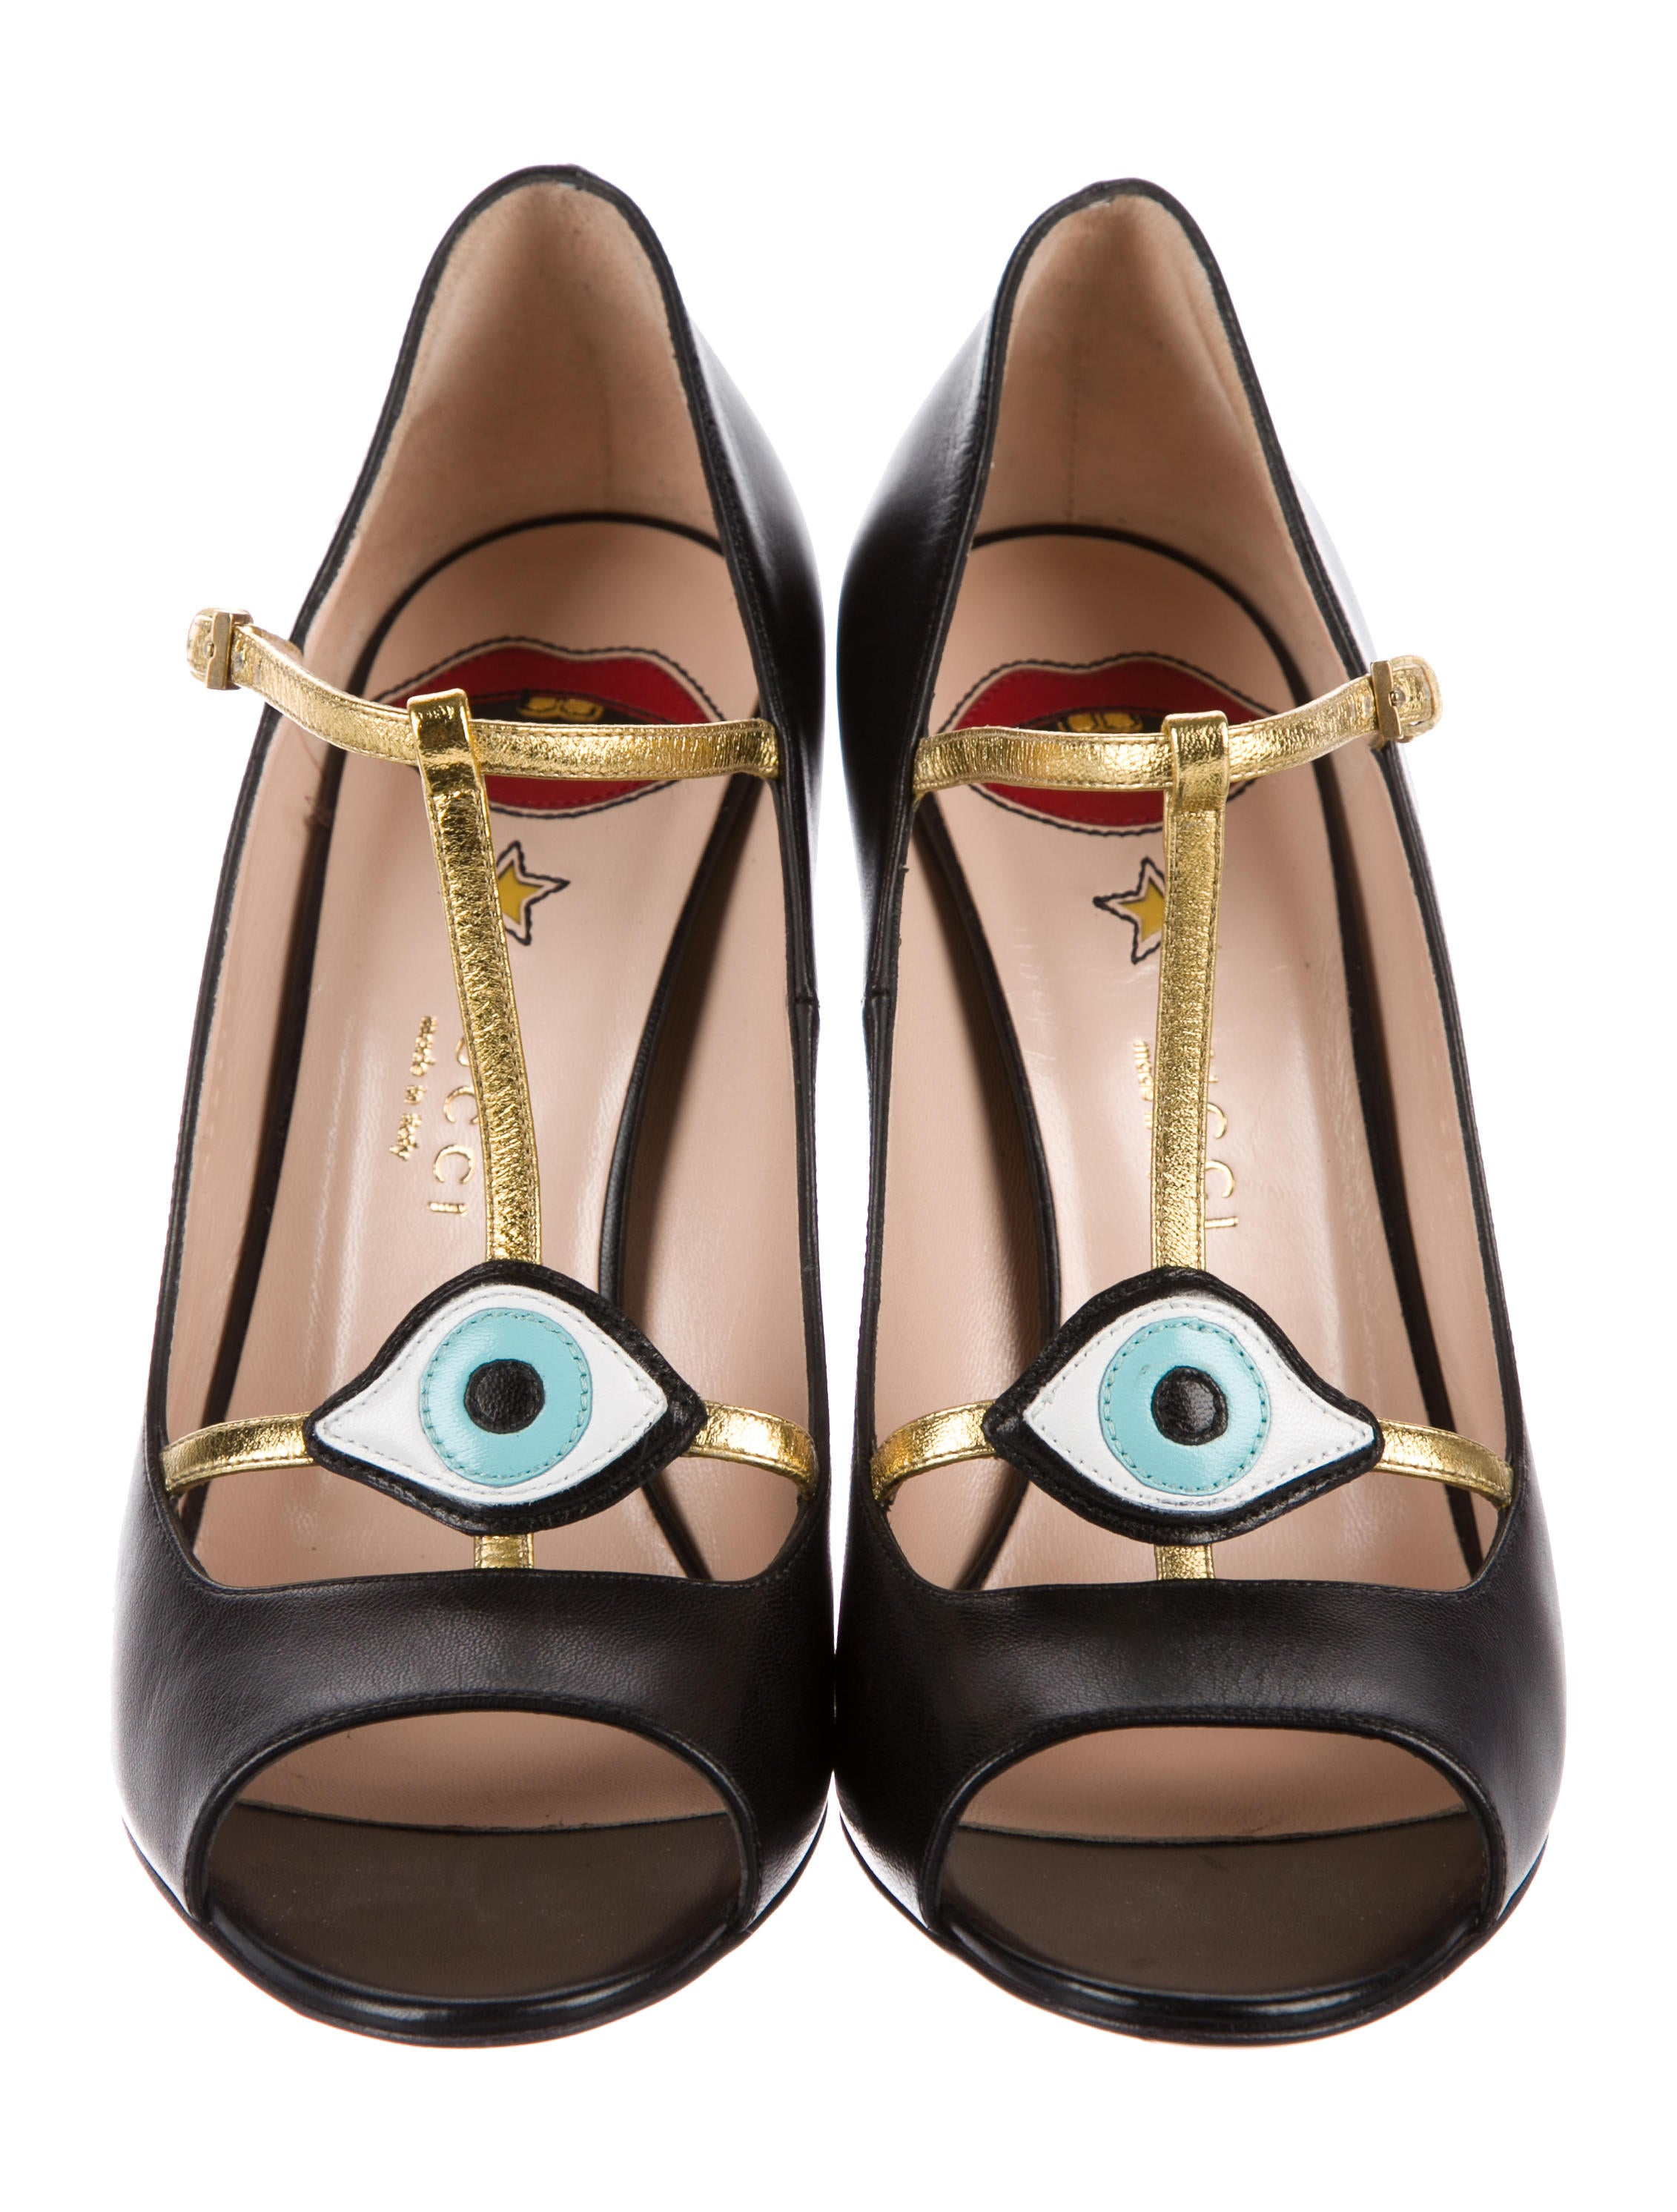 Gucci Shoes Buckle Women